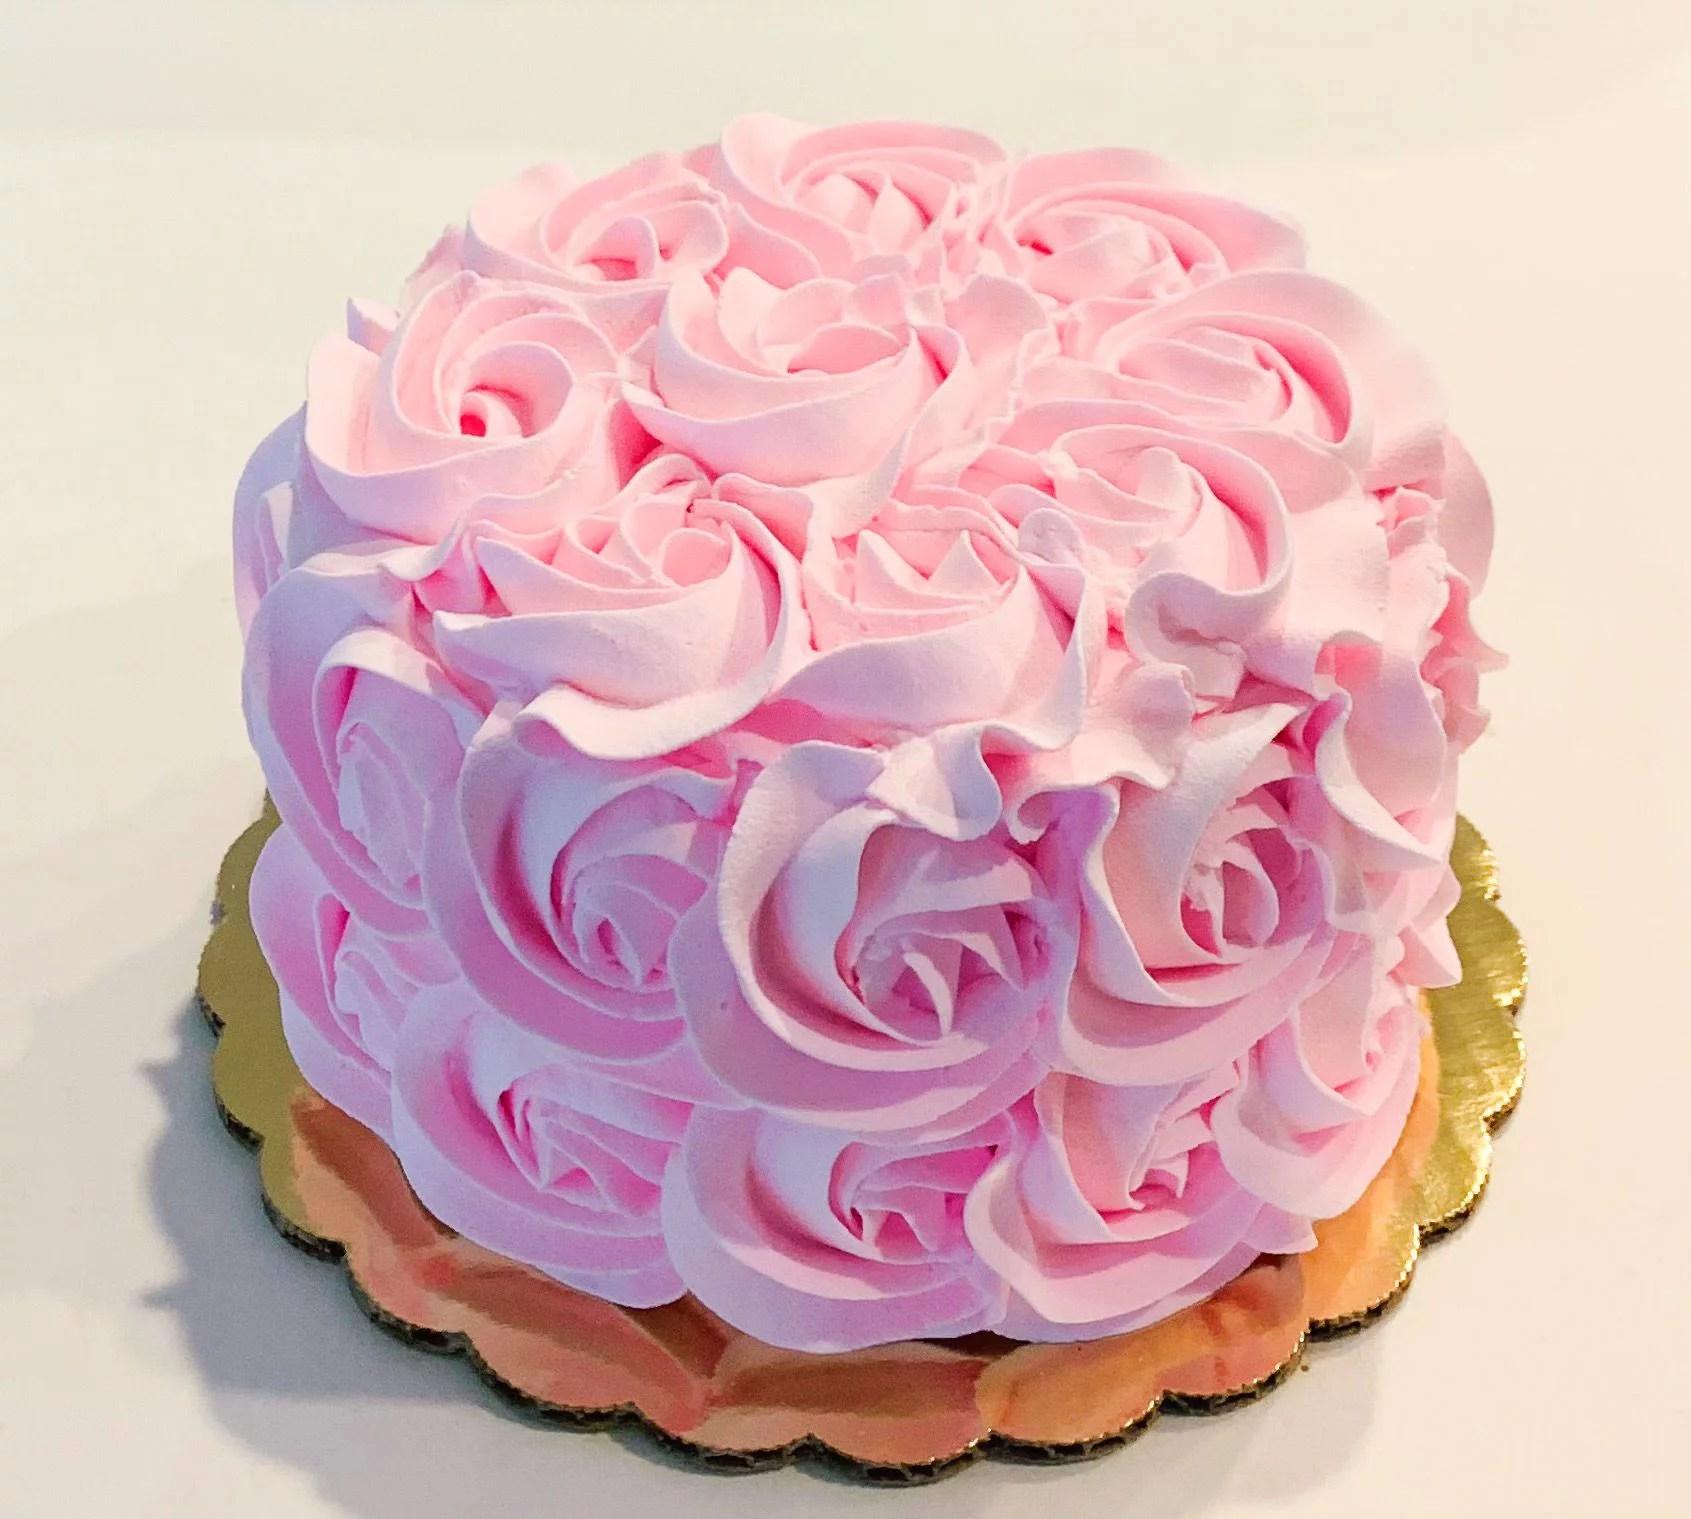 Fake Cake 6 Pretty Pink Rosette Cake Fake Unedible Prop Dezicakes Walmart Com Walmart Com